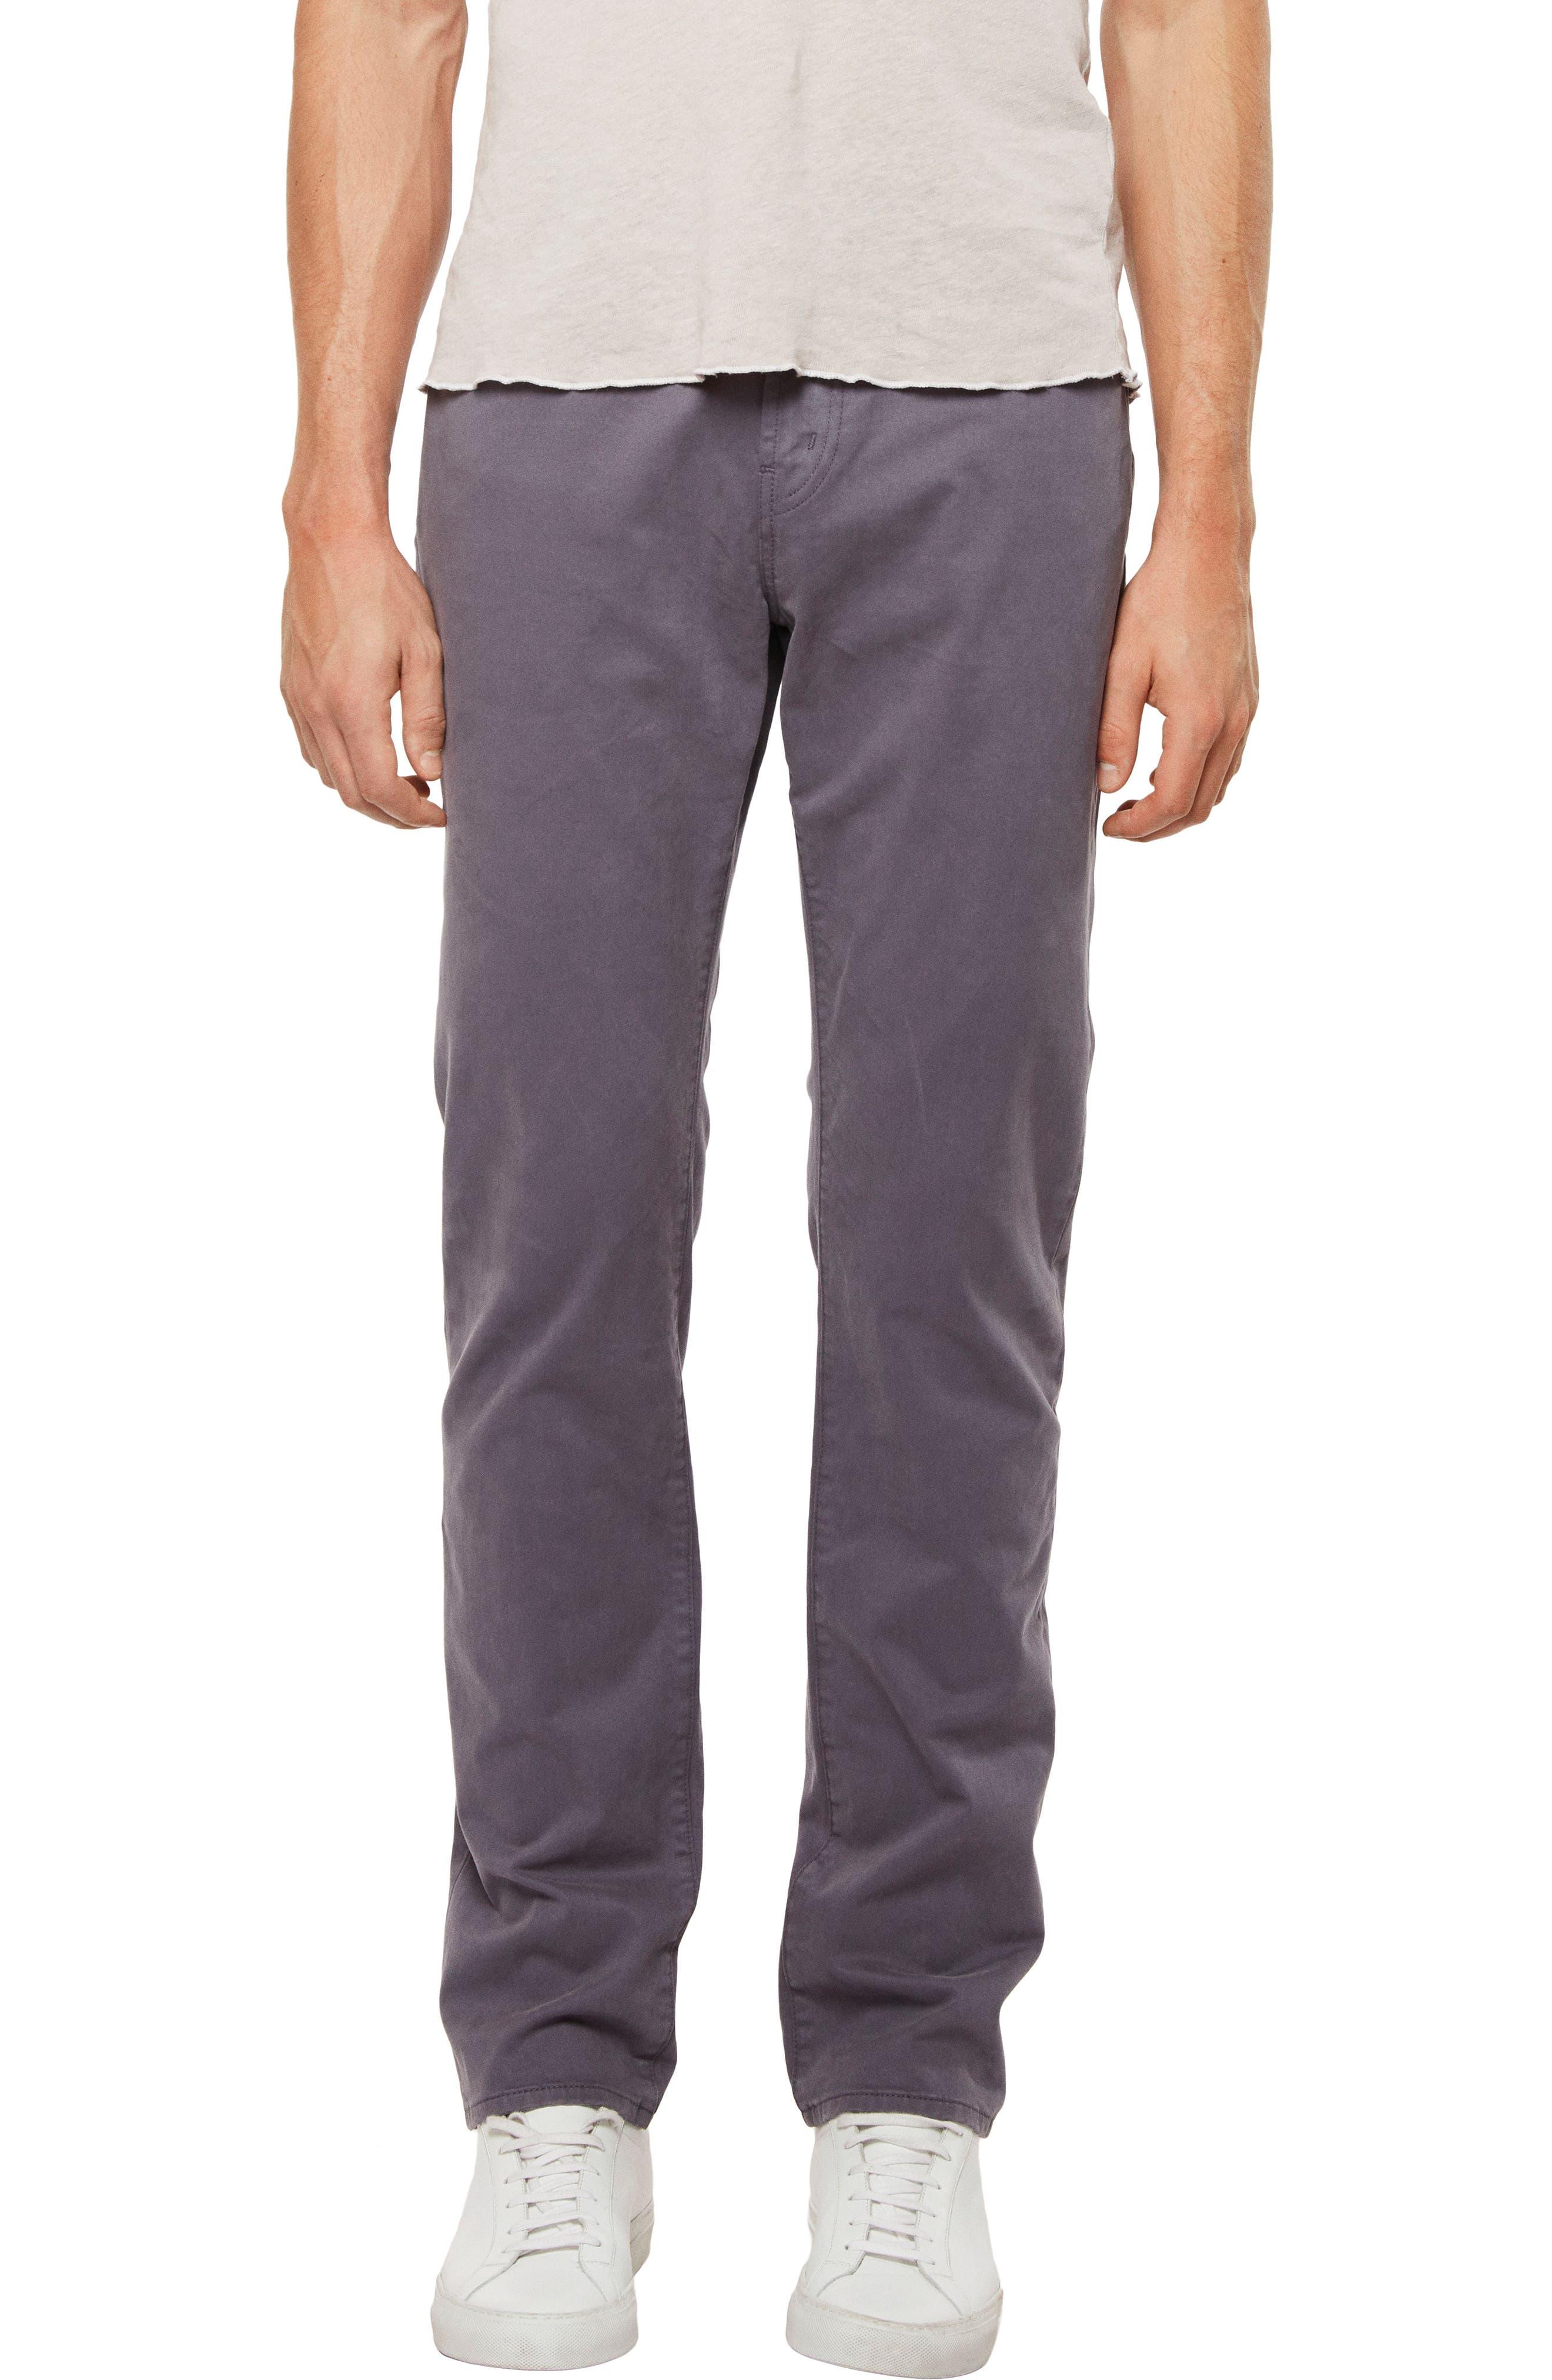 'Kane' Slim Fit Cotton Twill Pants,                             Main thumbnail 1, color,                             Graben